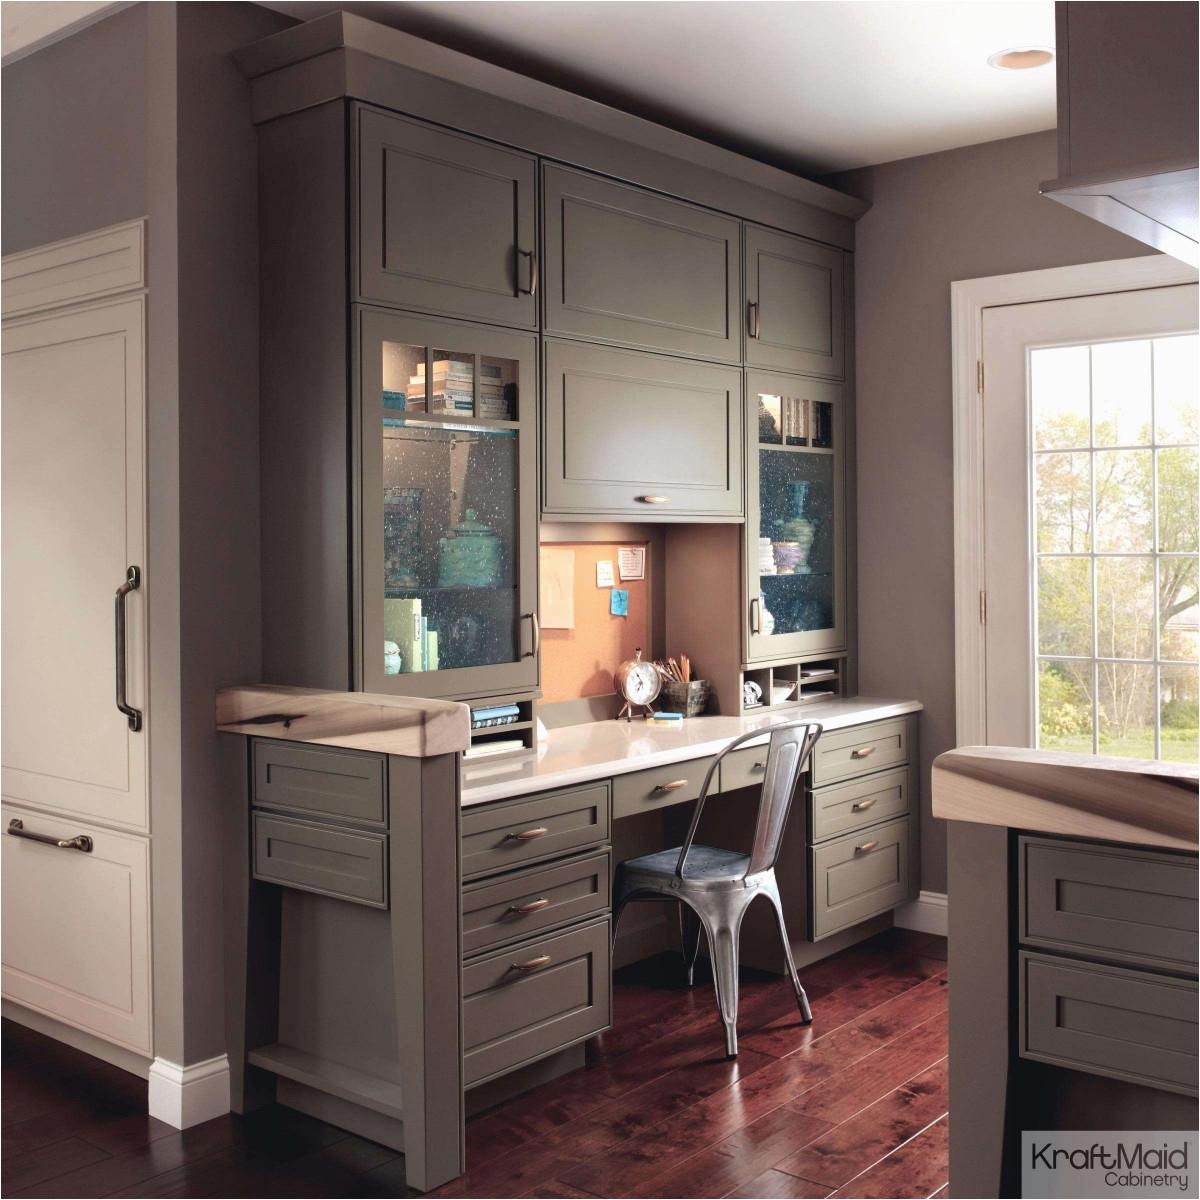 Corner Kitchen Cabinet 35 Antique Corner Kitchen Cabinet Ideas that are Anything but Dull